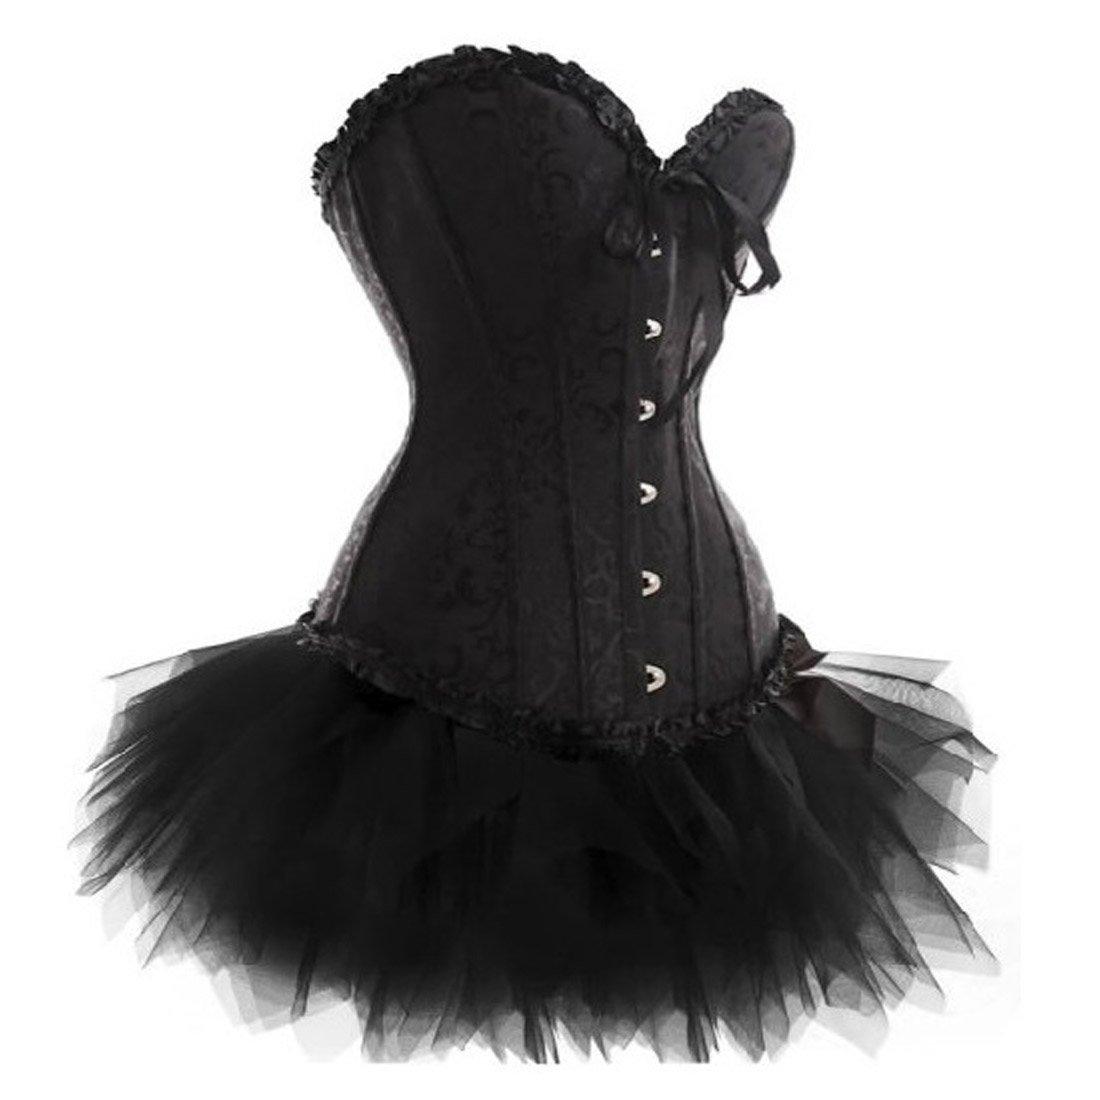 LFFW Brocade Slim Body Shaper Lace up Boned Corset Tutu//Black Skirt DressPlus Size